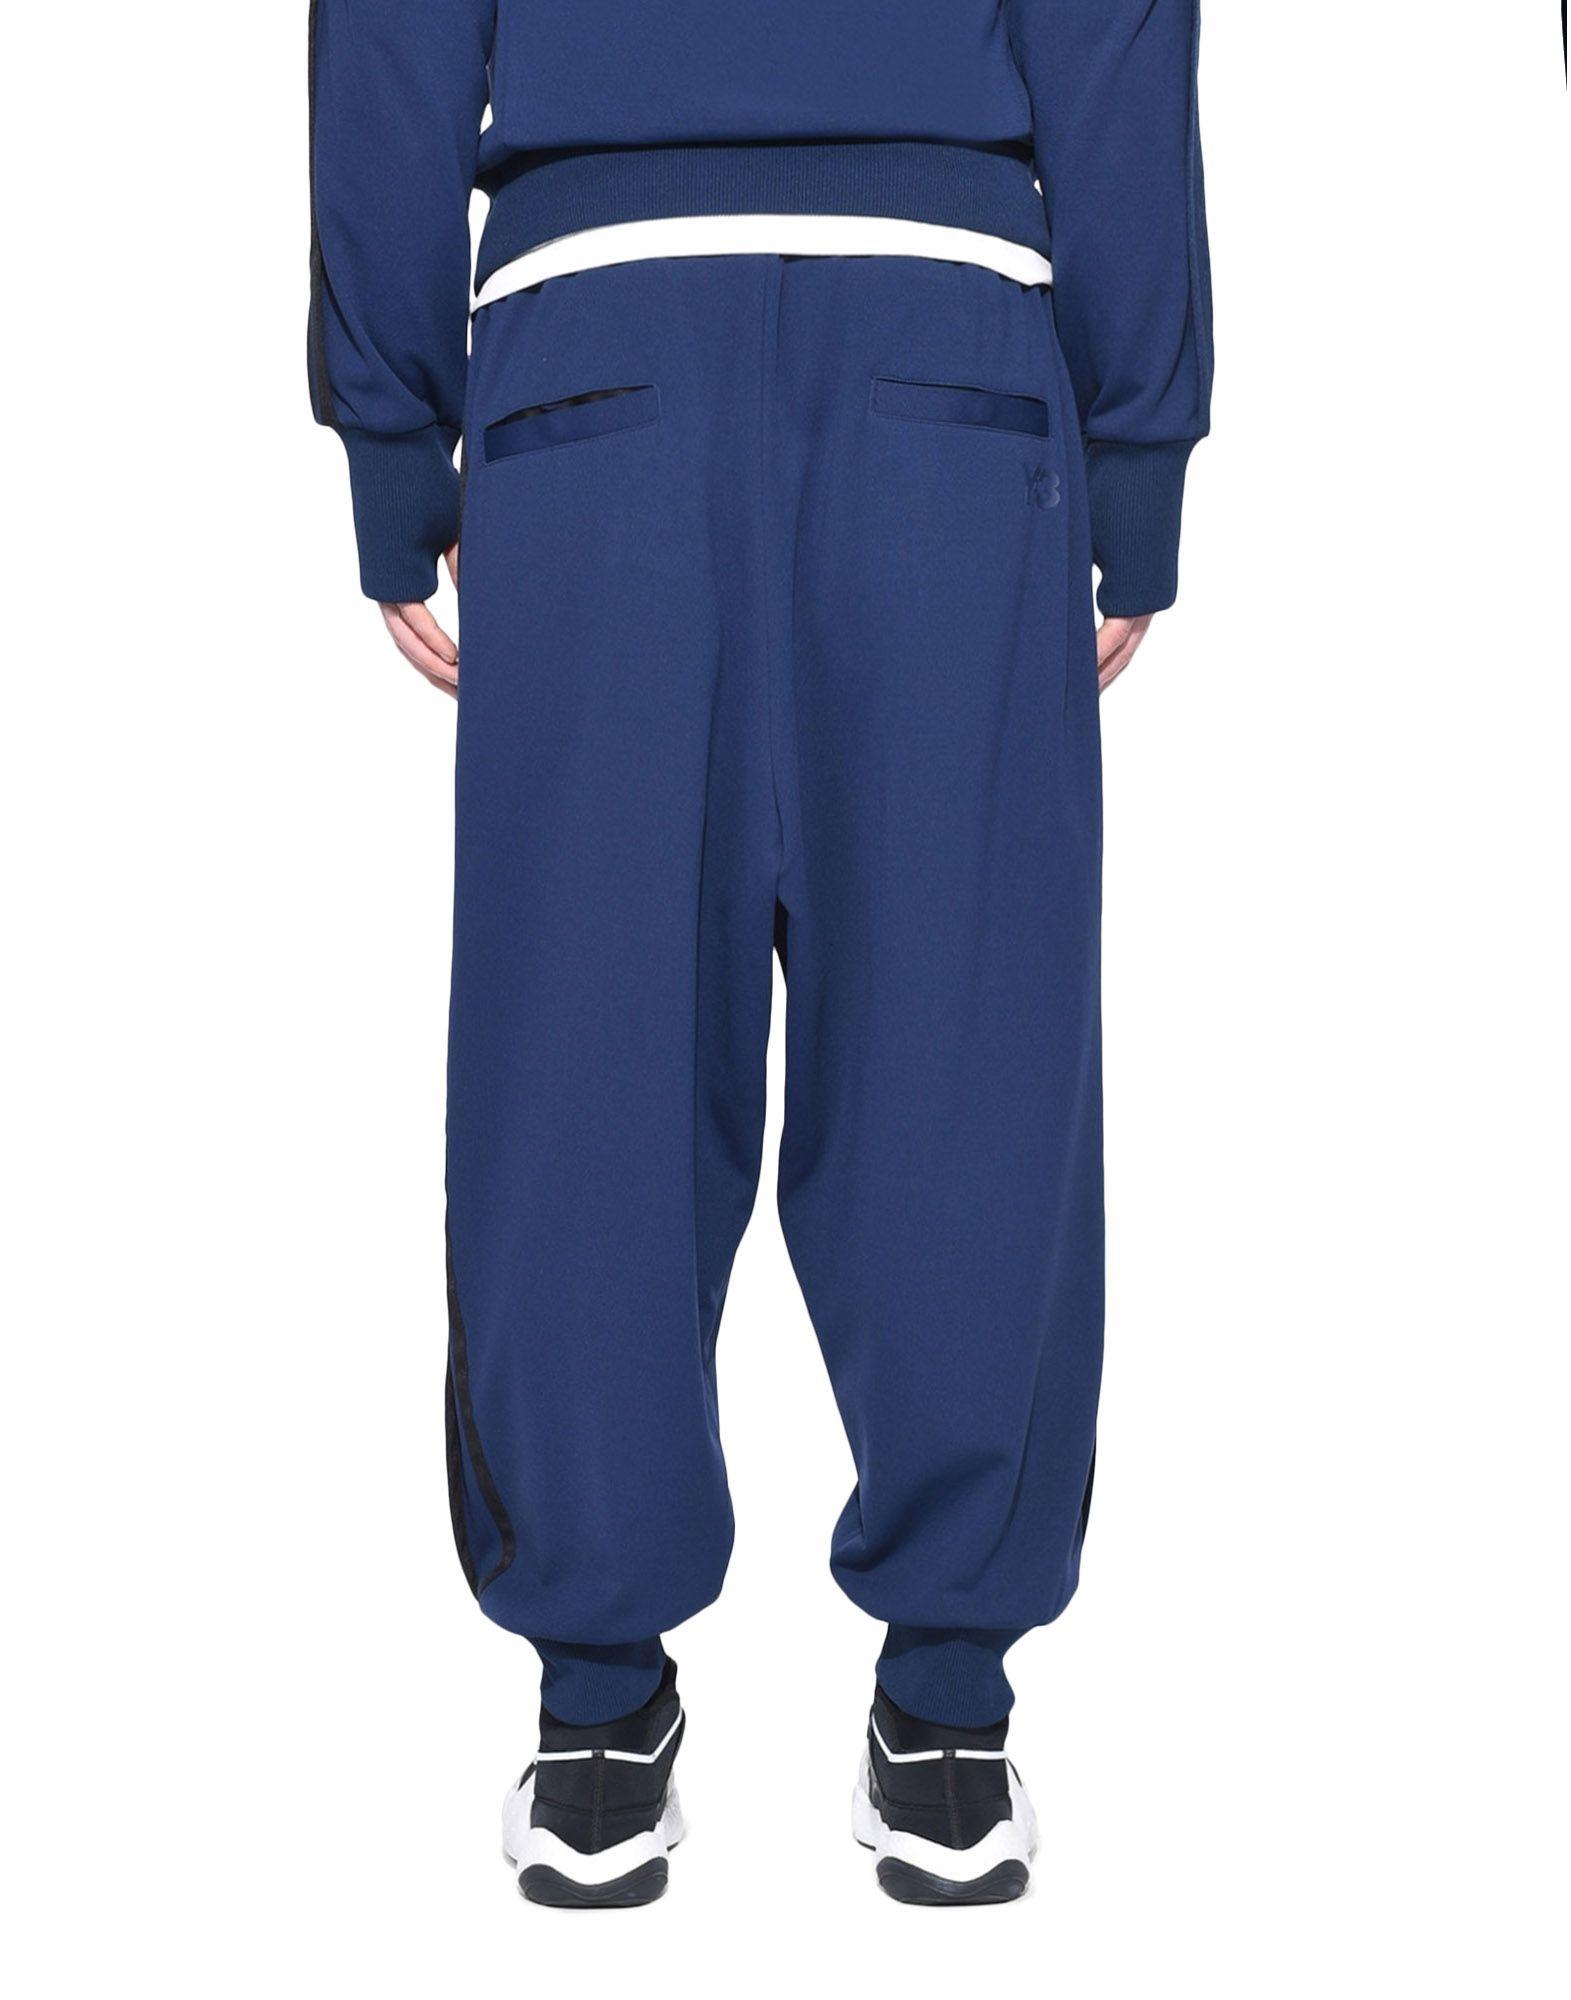 Y-3 Y-3 3-Stripes Selvedge Matte Track Pants Track pant Man d